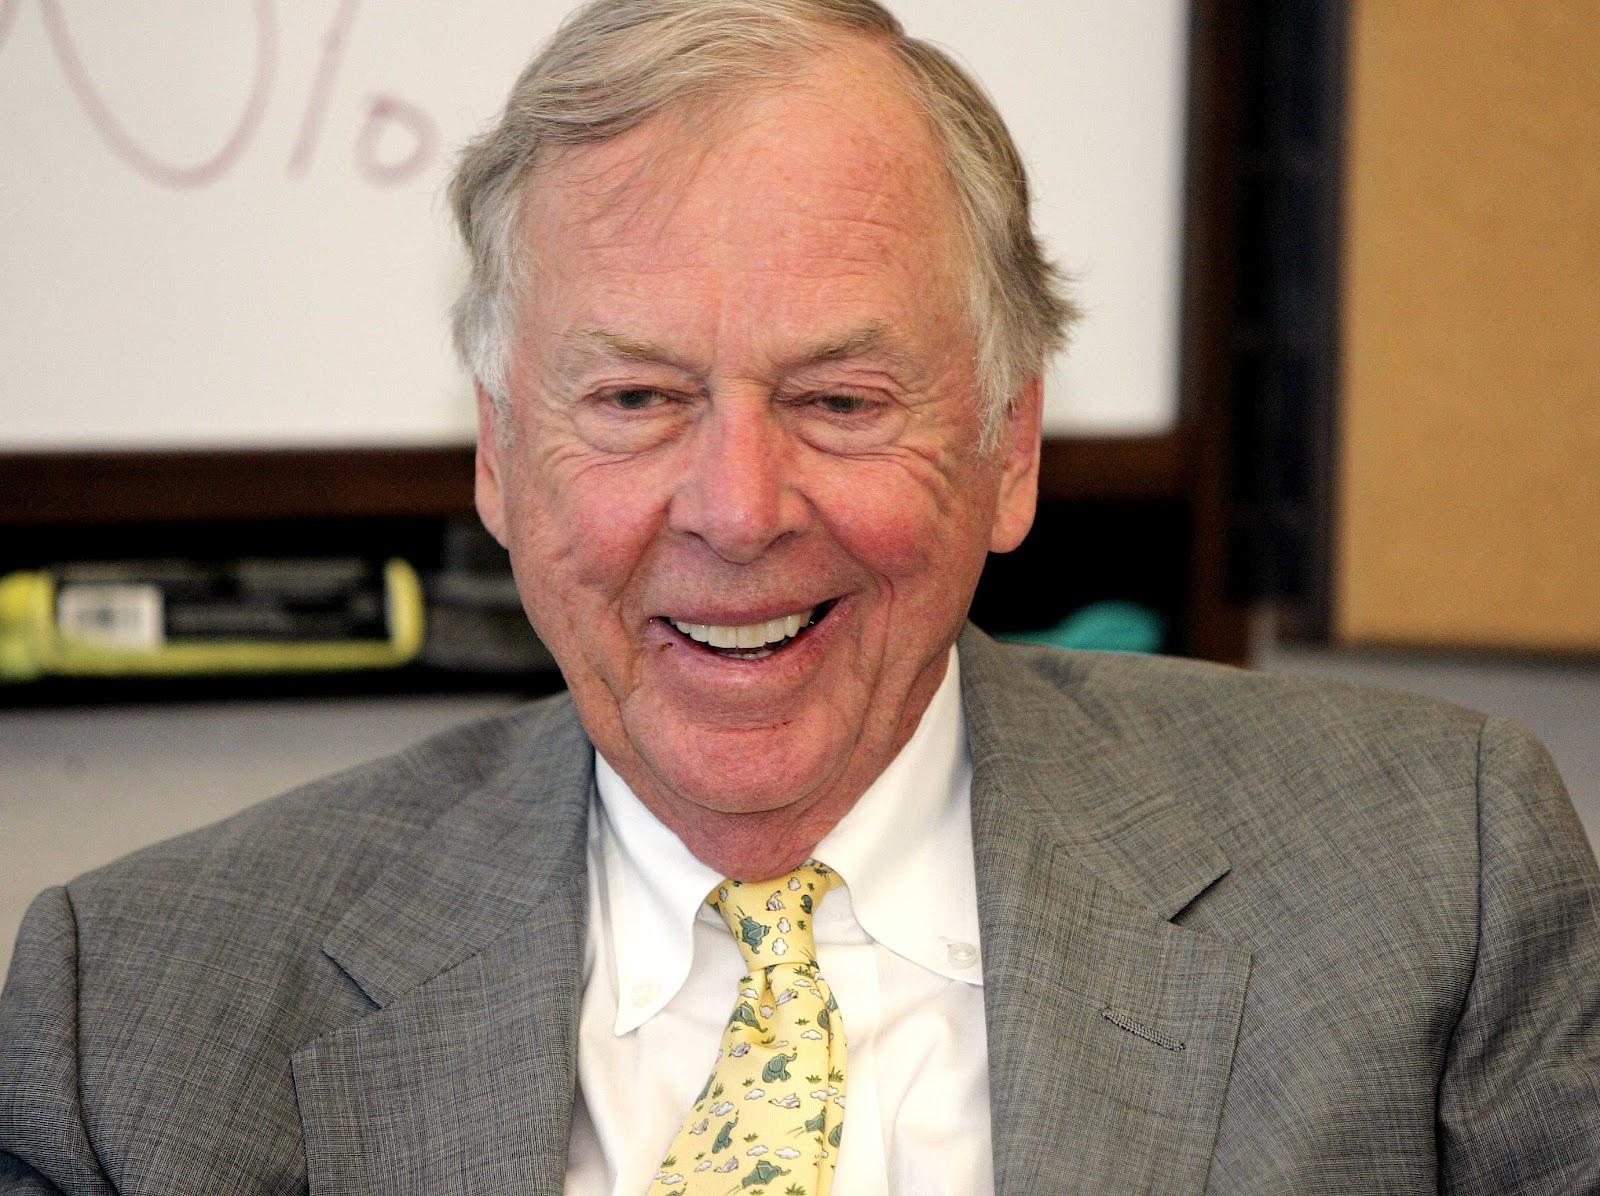 T. Boone Pickens Blog: 2012